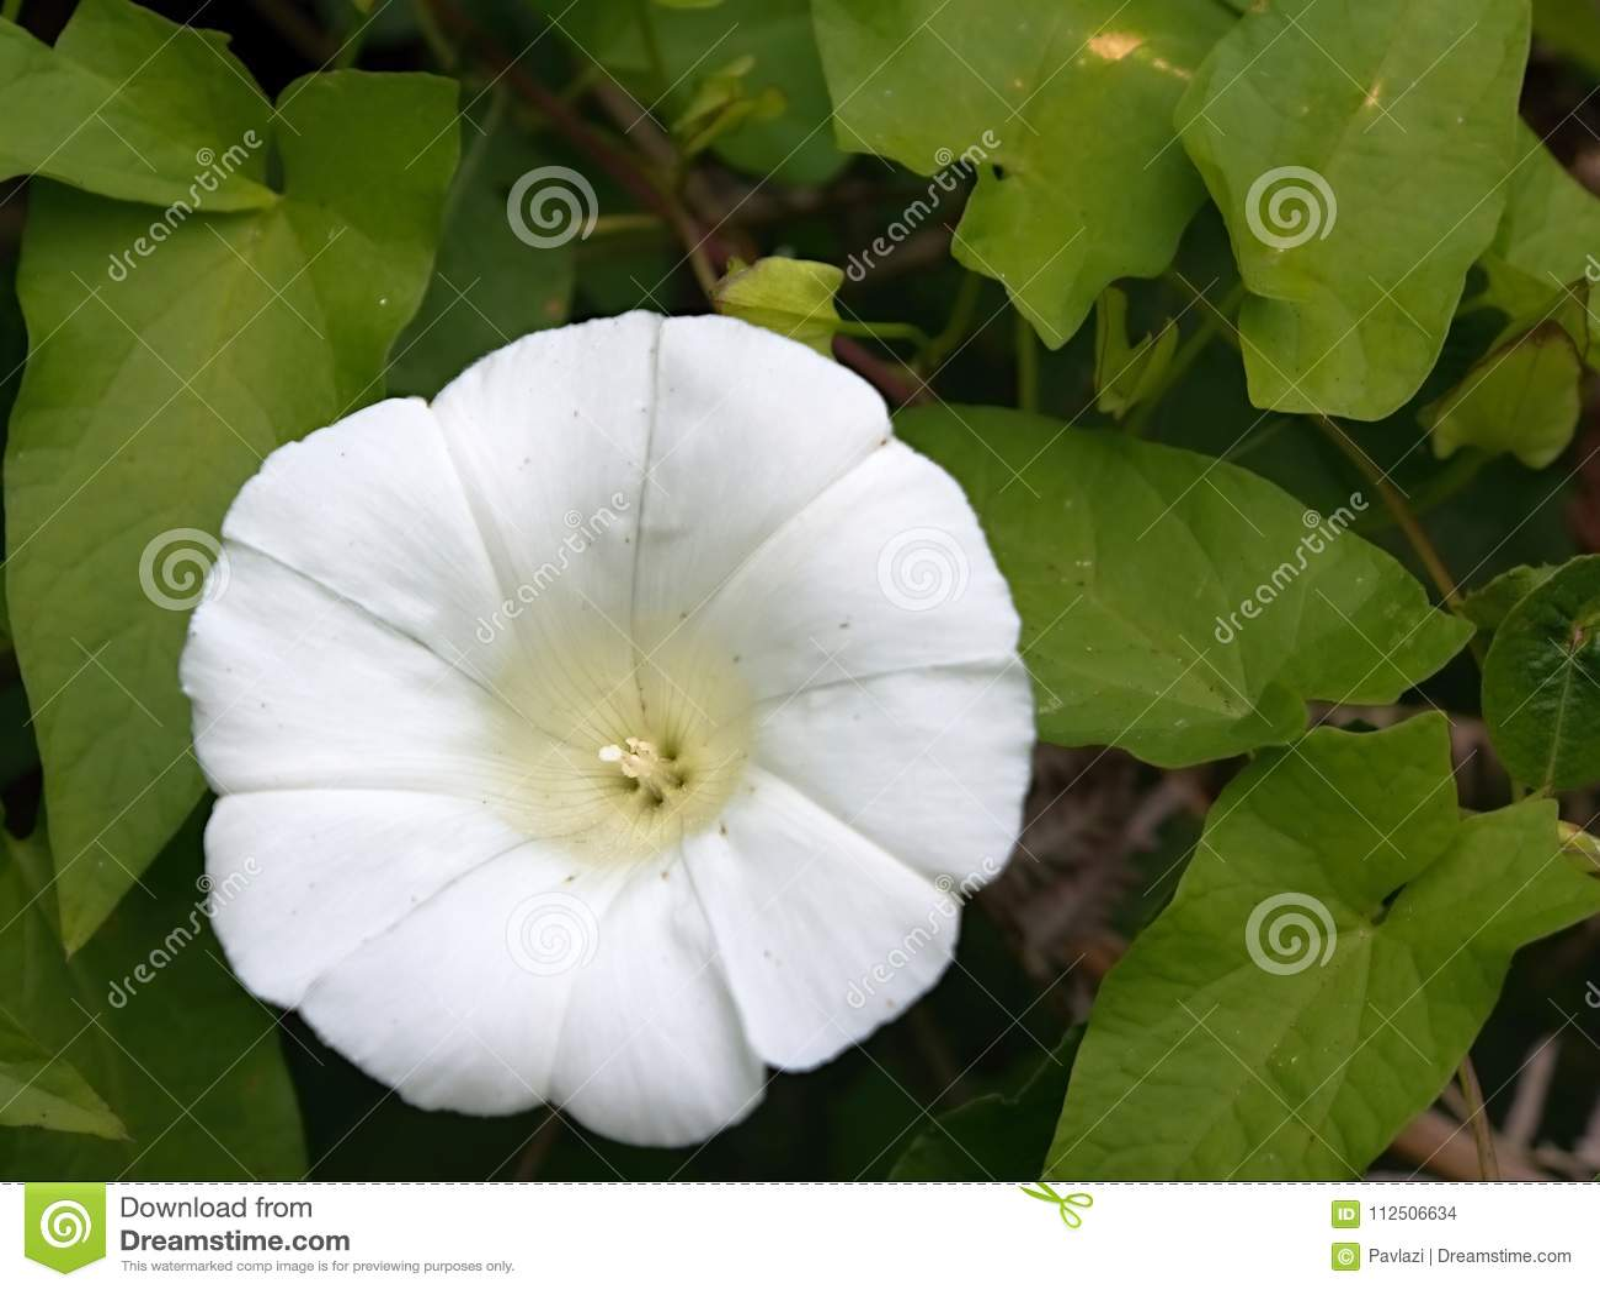 White convolvulus morning glory flower stock photo image of green download white convolvulus morning glory flower stock photo image of green pollen mightylinksfo